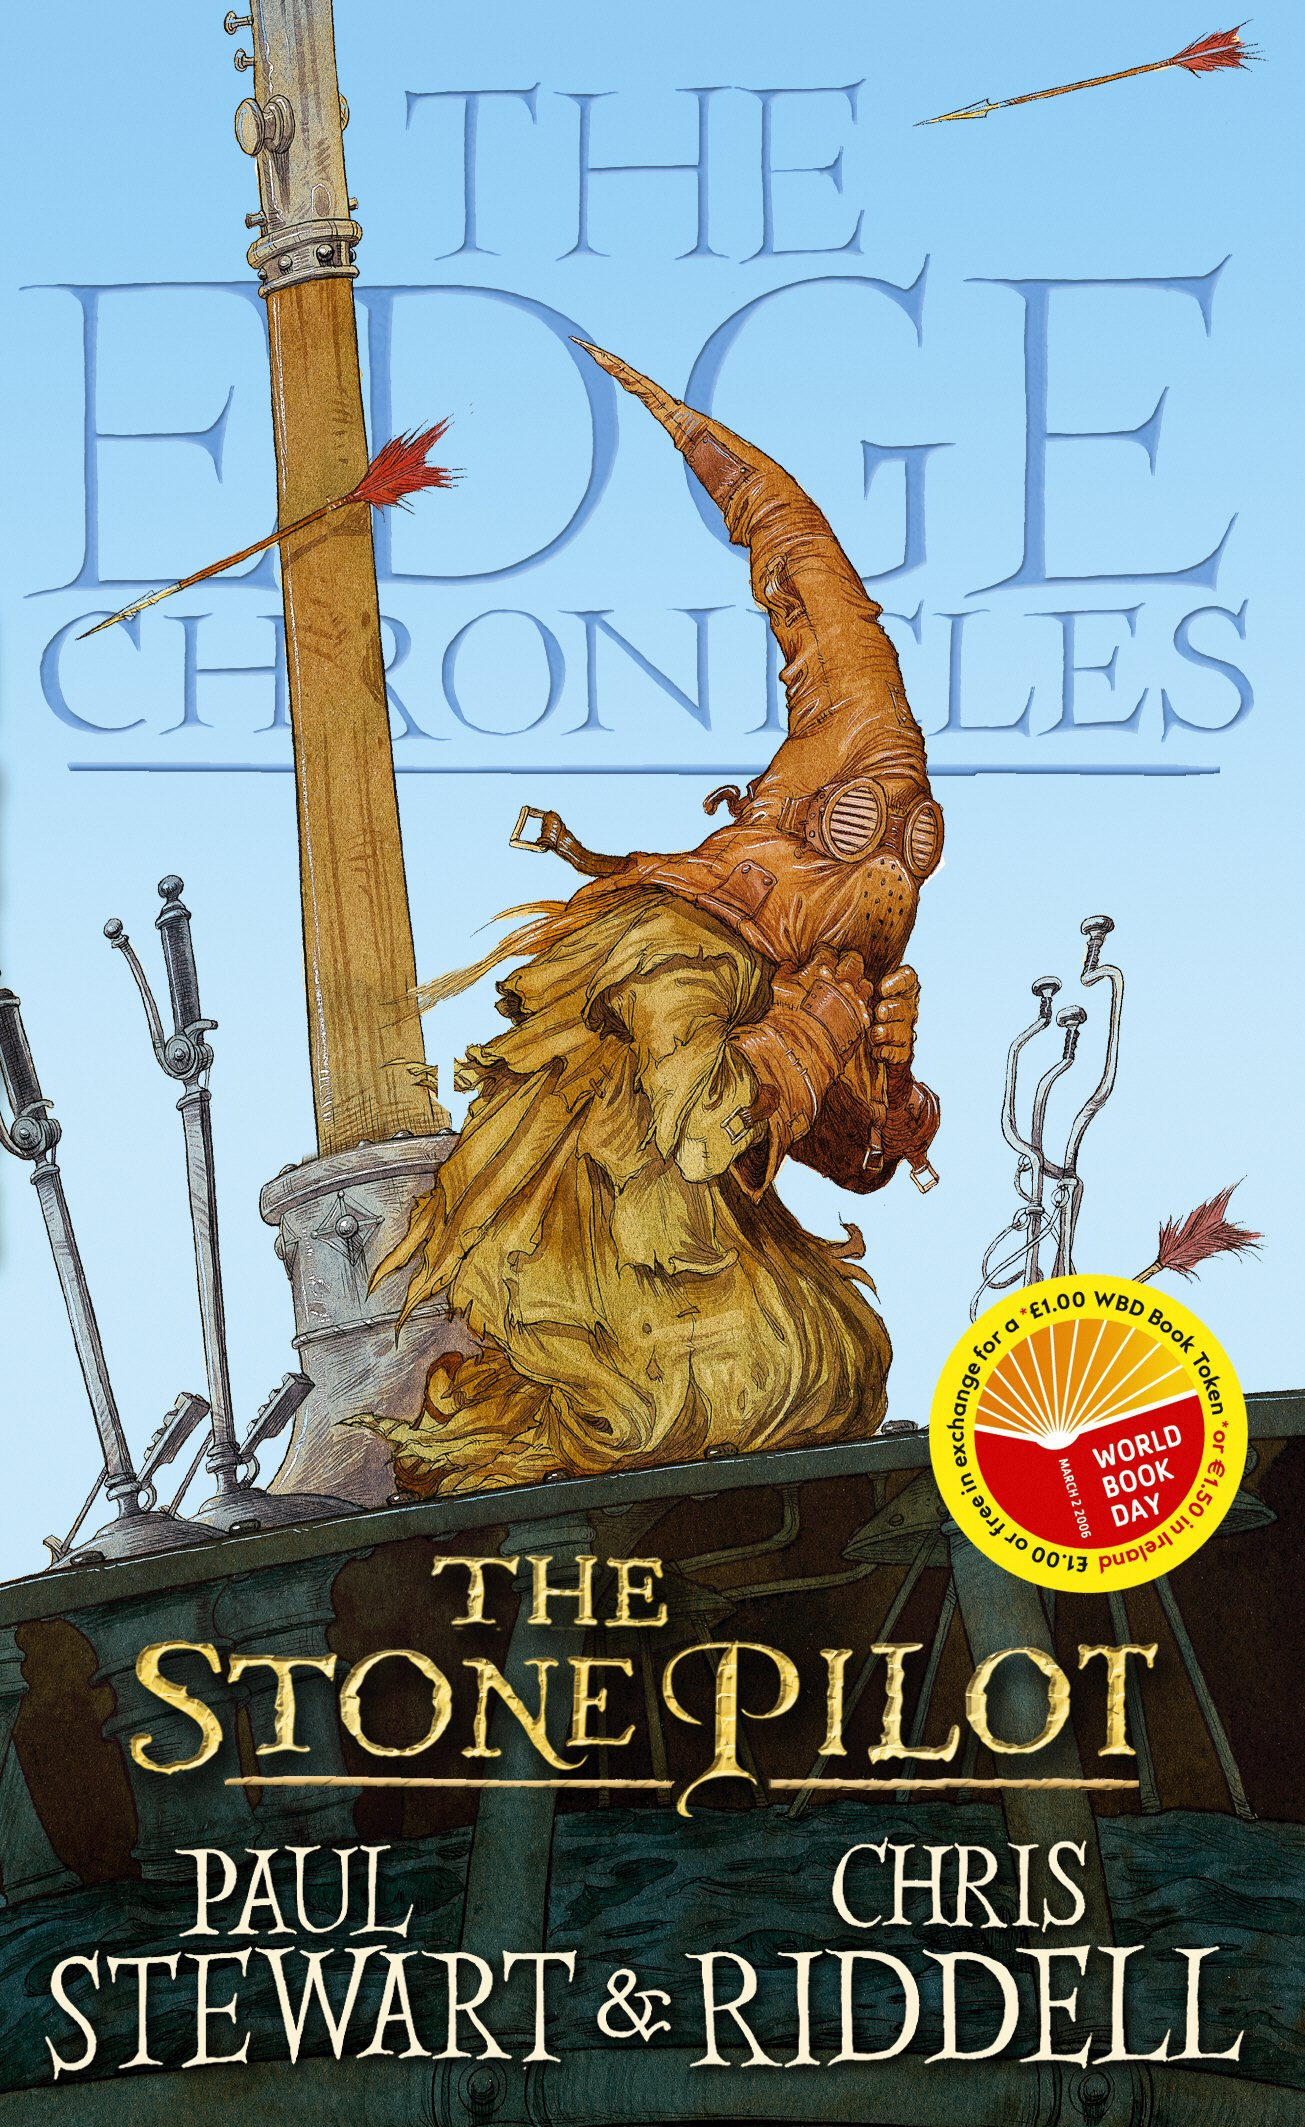 the edge chronicles 3 clash of the sky galleons stewart paul riddell chris